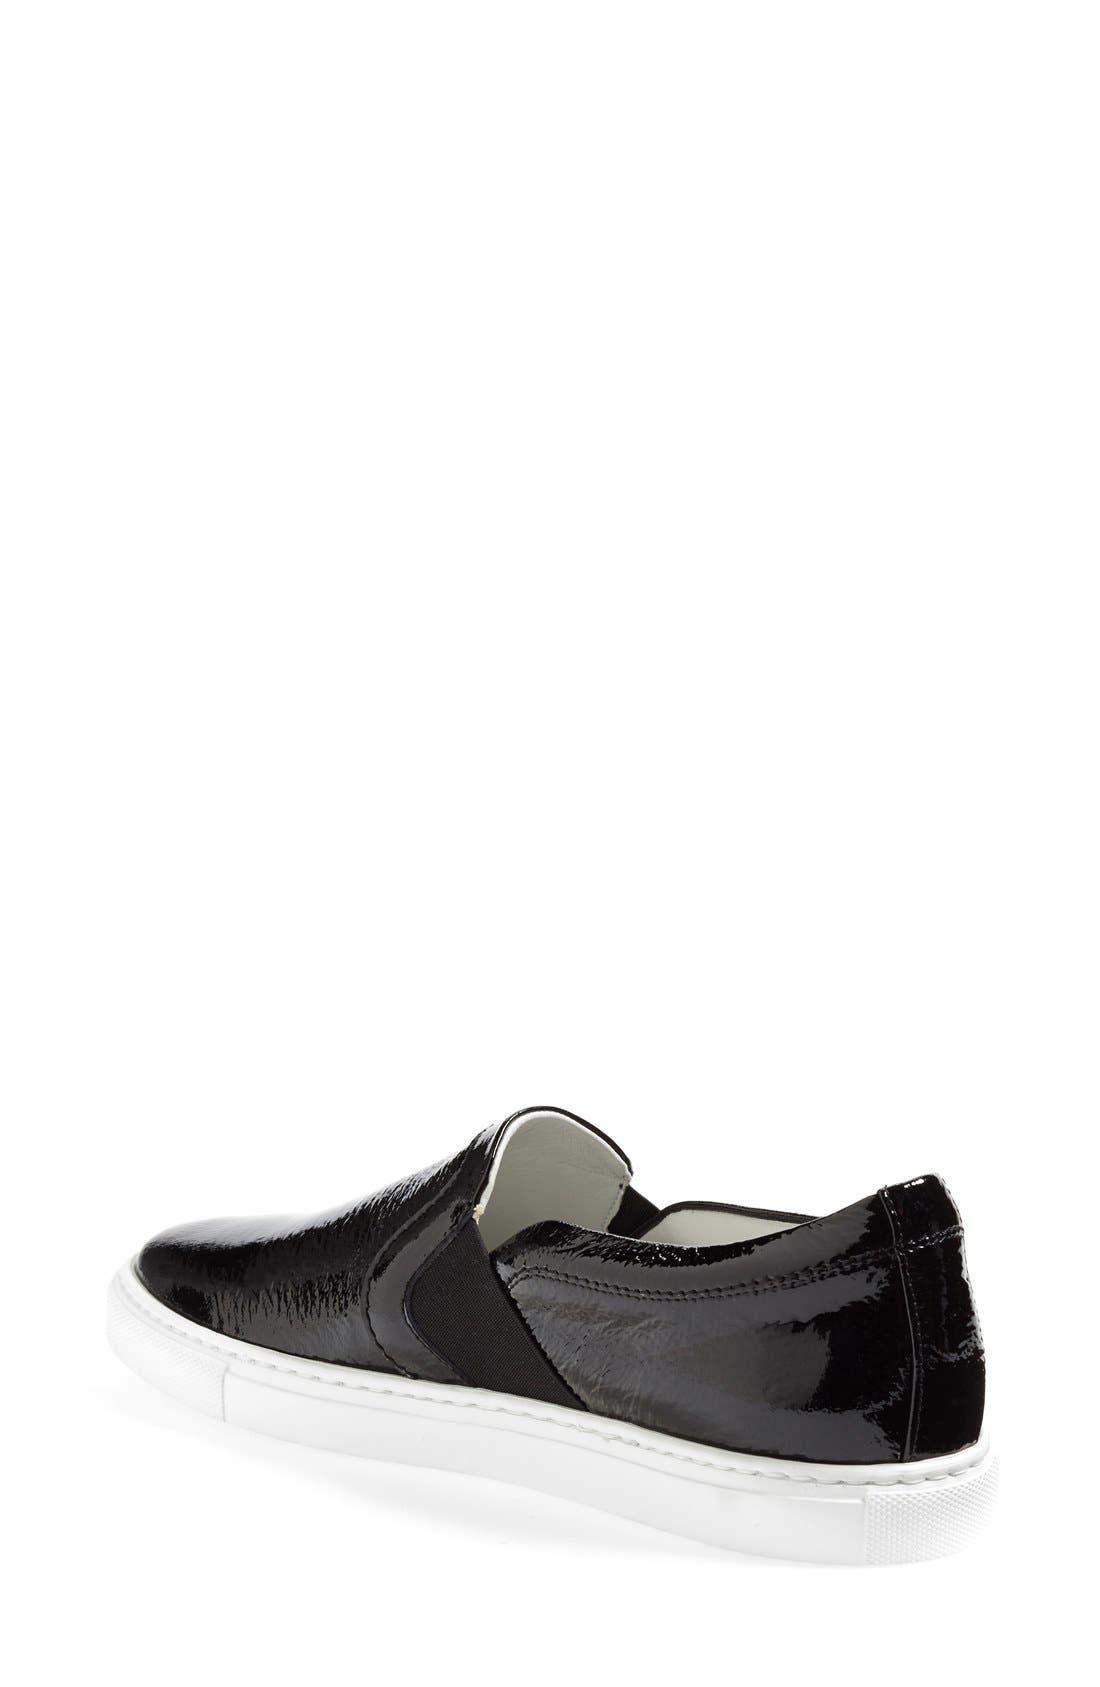 Alternate Image 2  - Lanvin Patent Leather Skate Sneaker (Women)